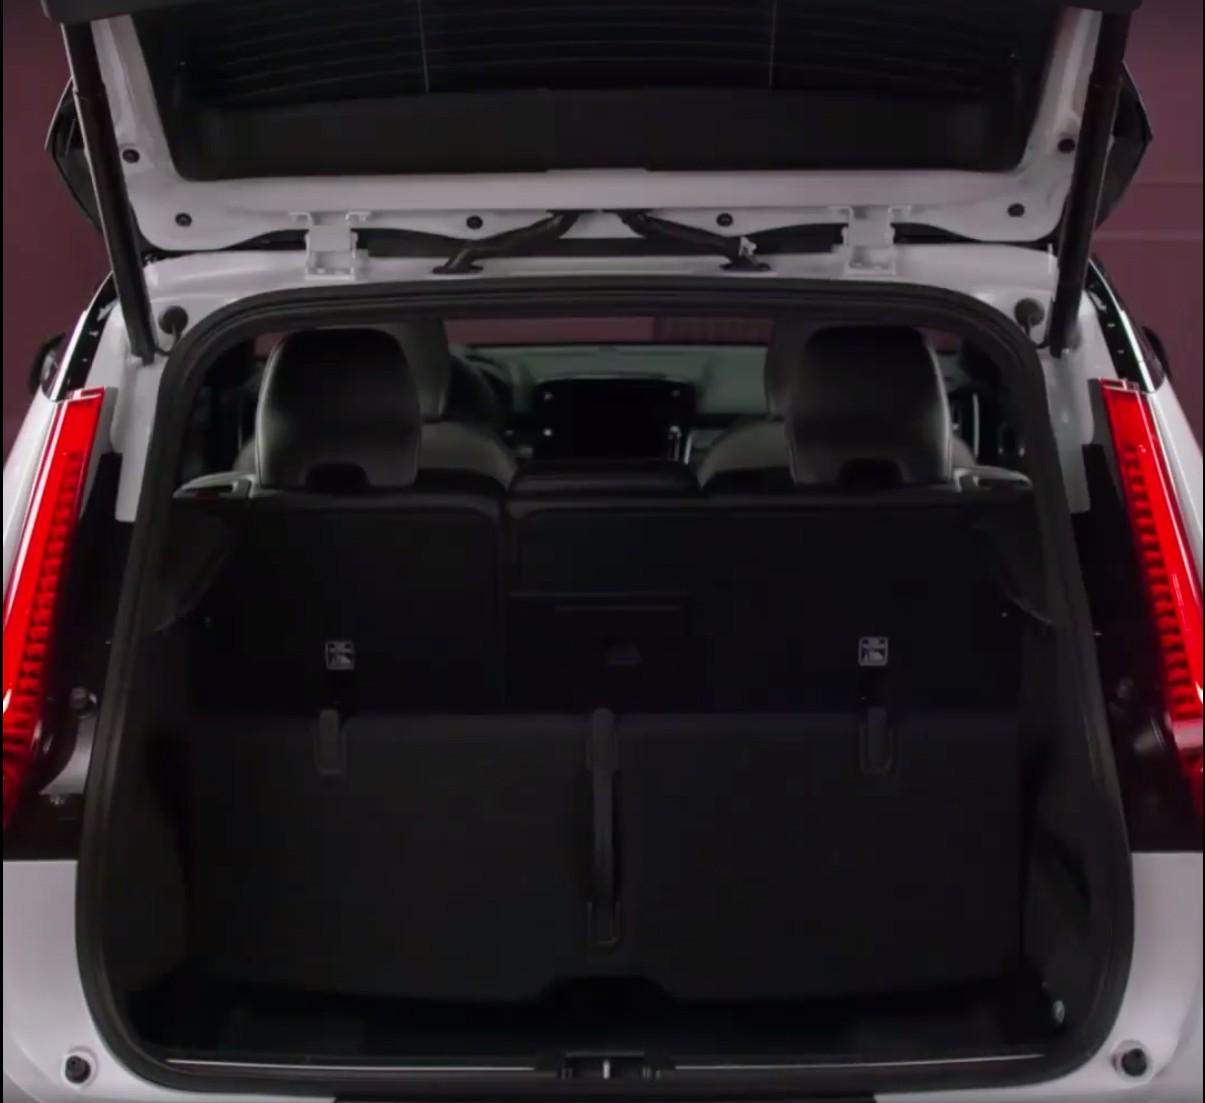 2018 Volvo XC40 leaked online, T5 hybrid confirmed | PerformanceDrive